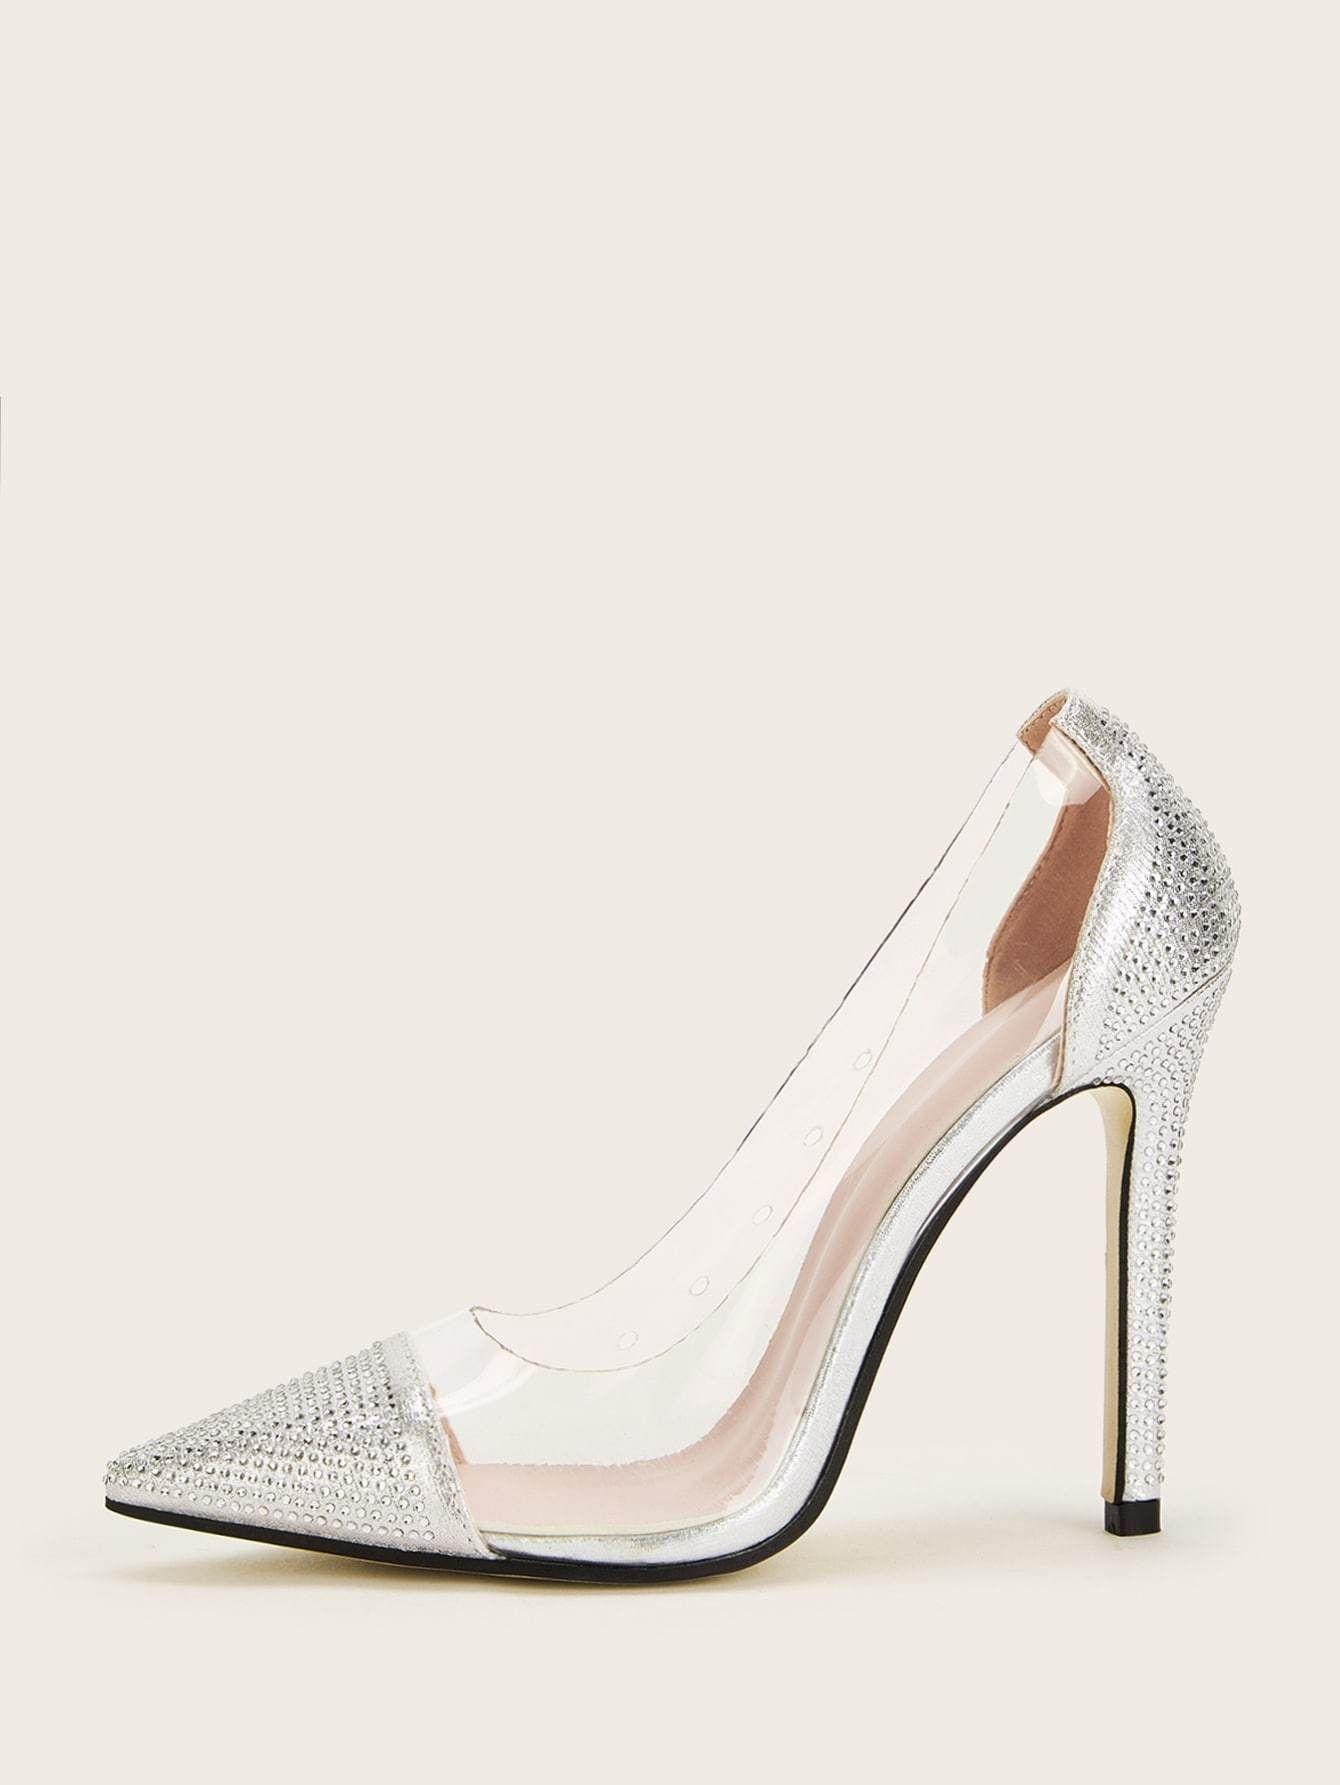 Transparent Point Toe Stiletto Heels   Stiletto heels, Heels